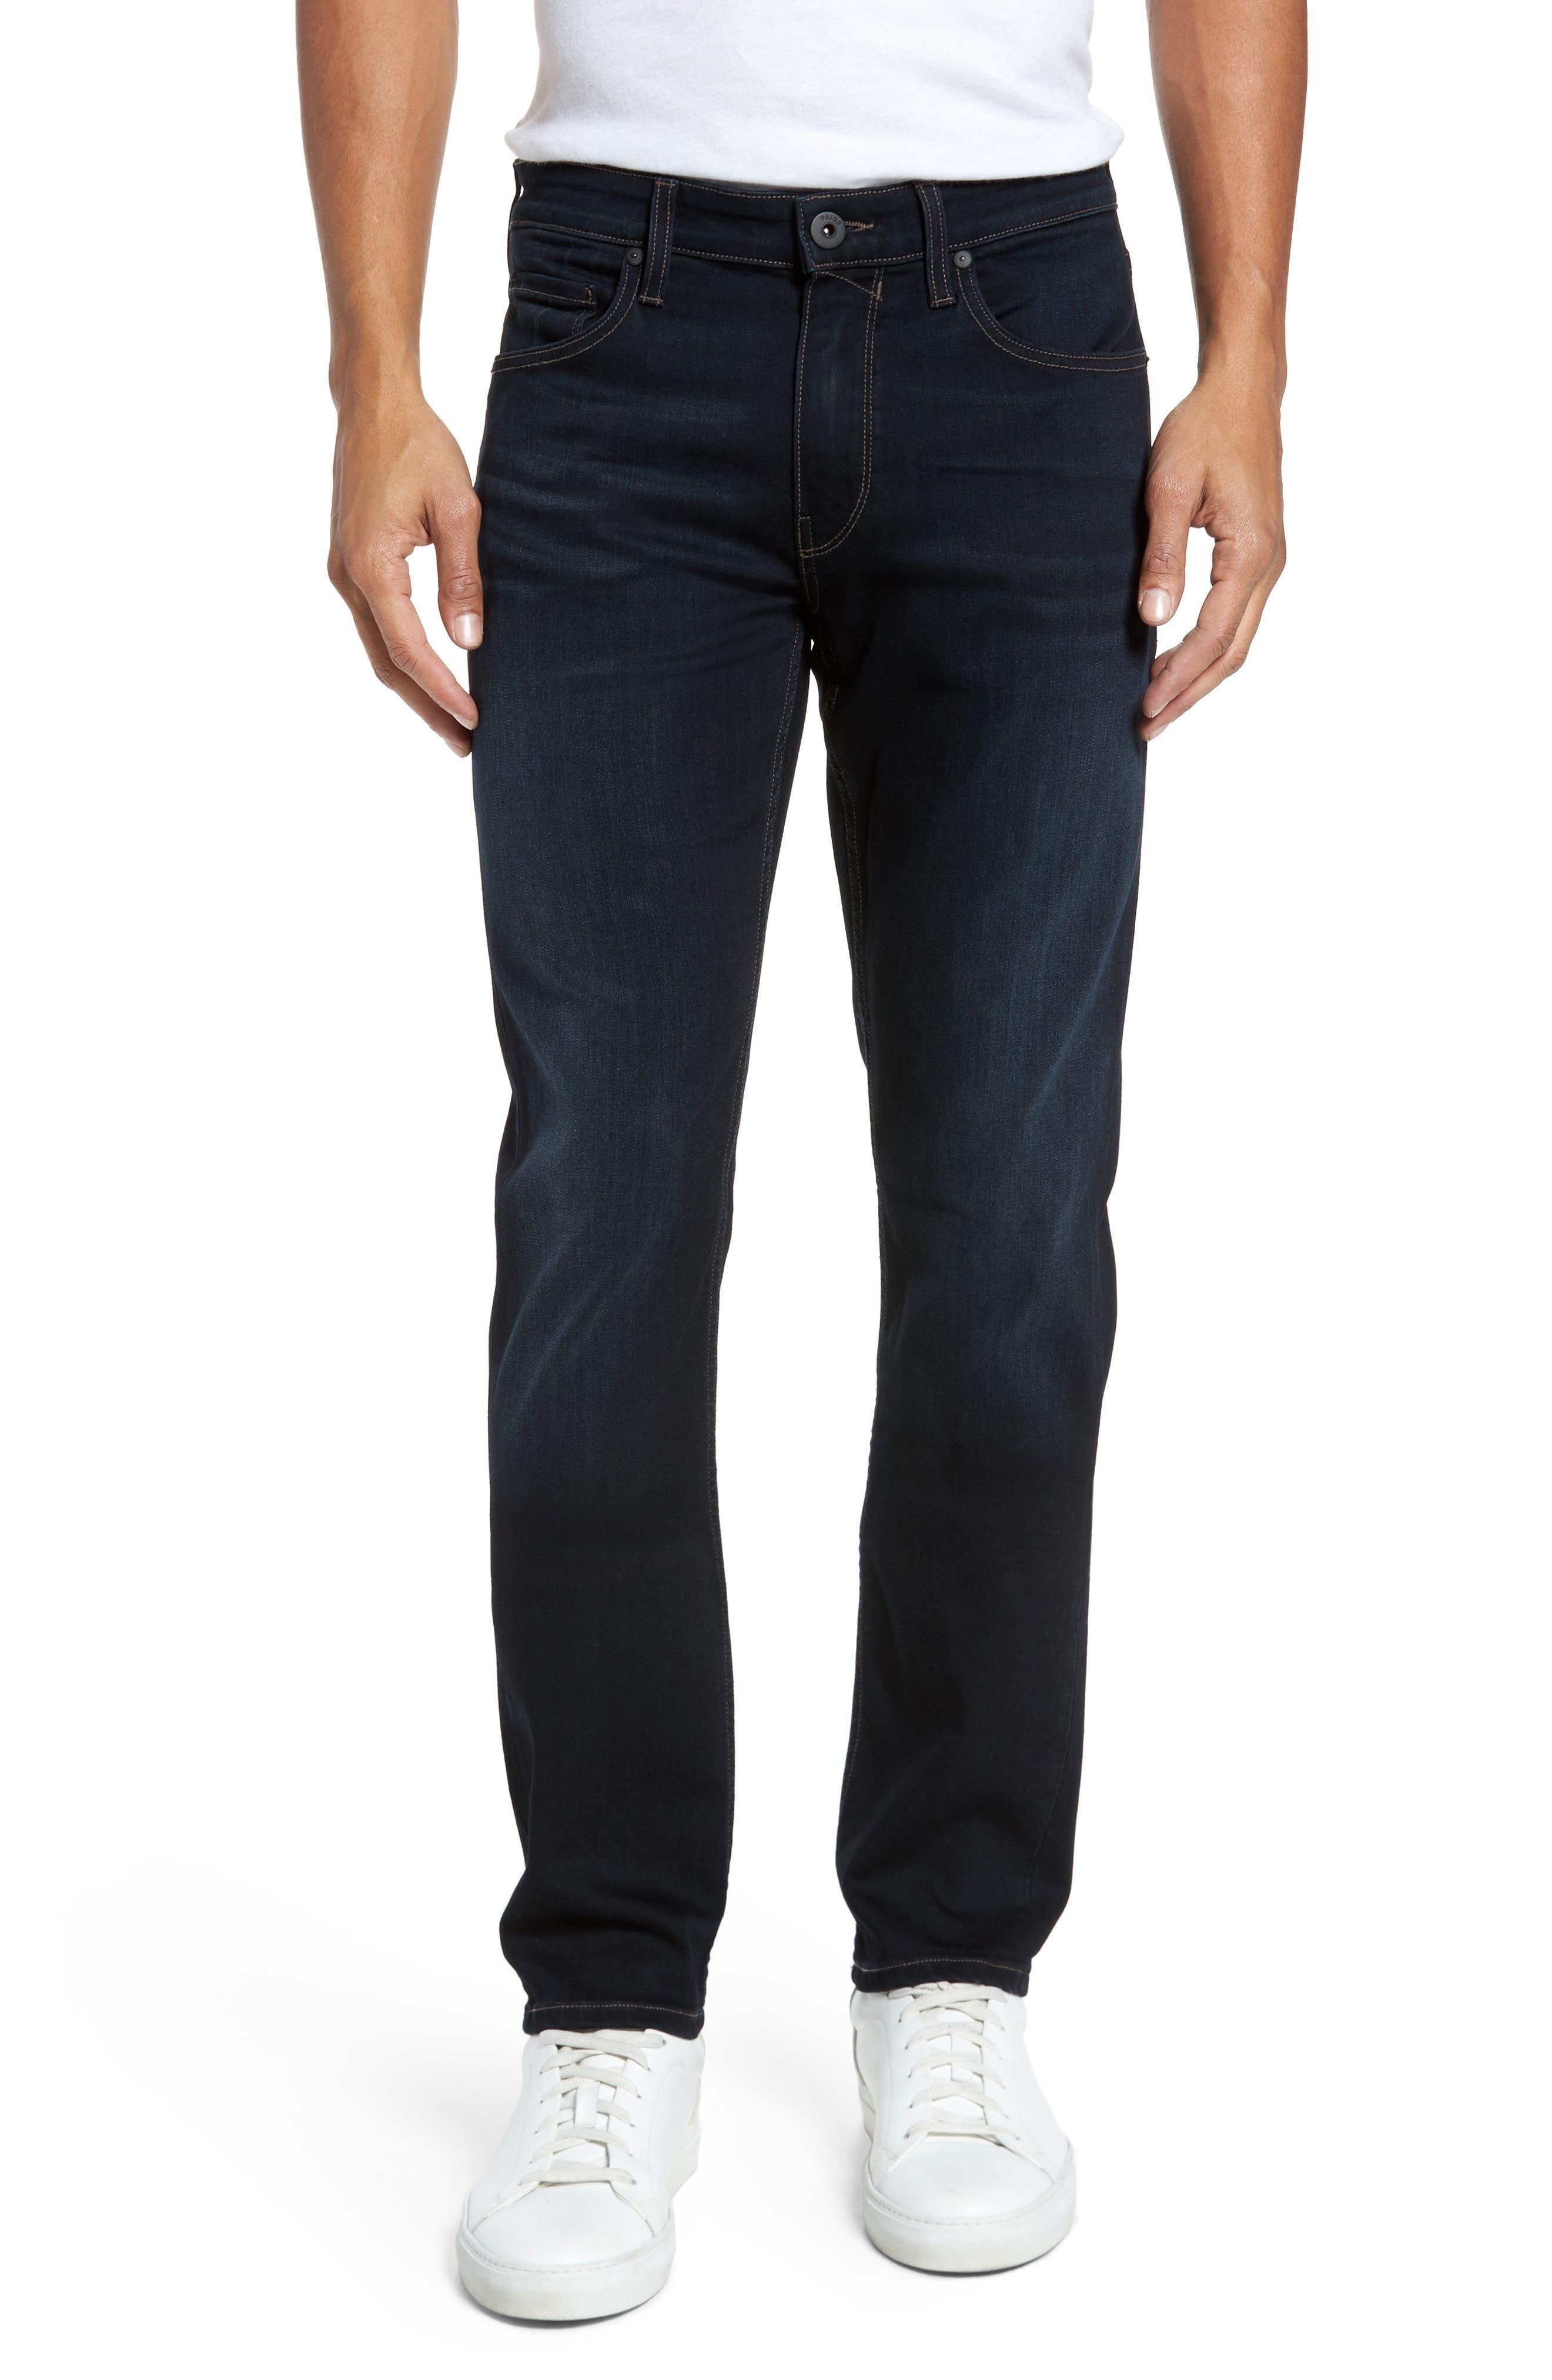 PAIGE Transcend - Lennox Slim Fit Jeans (Rafter)